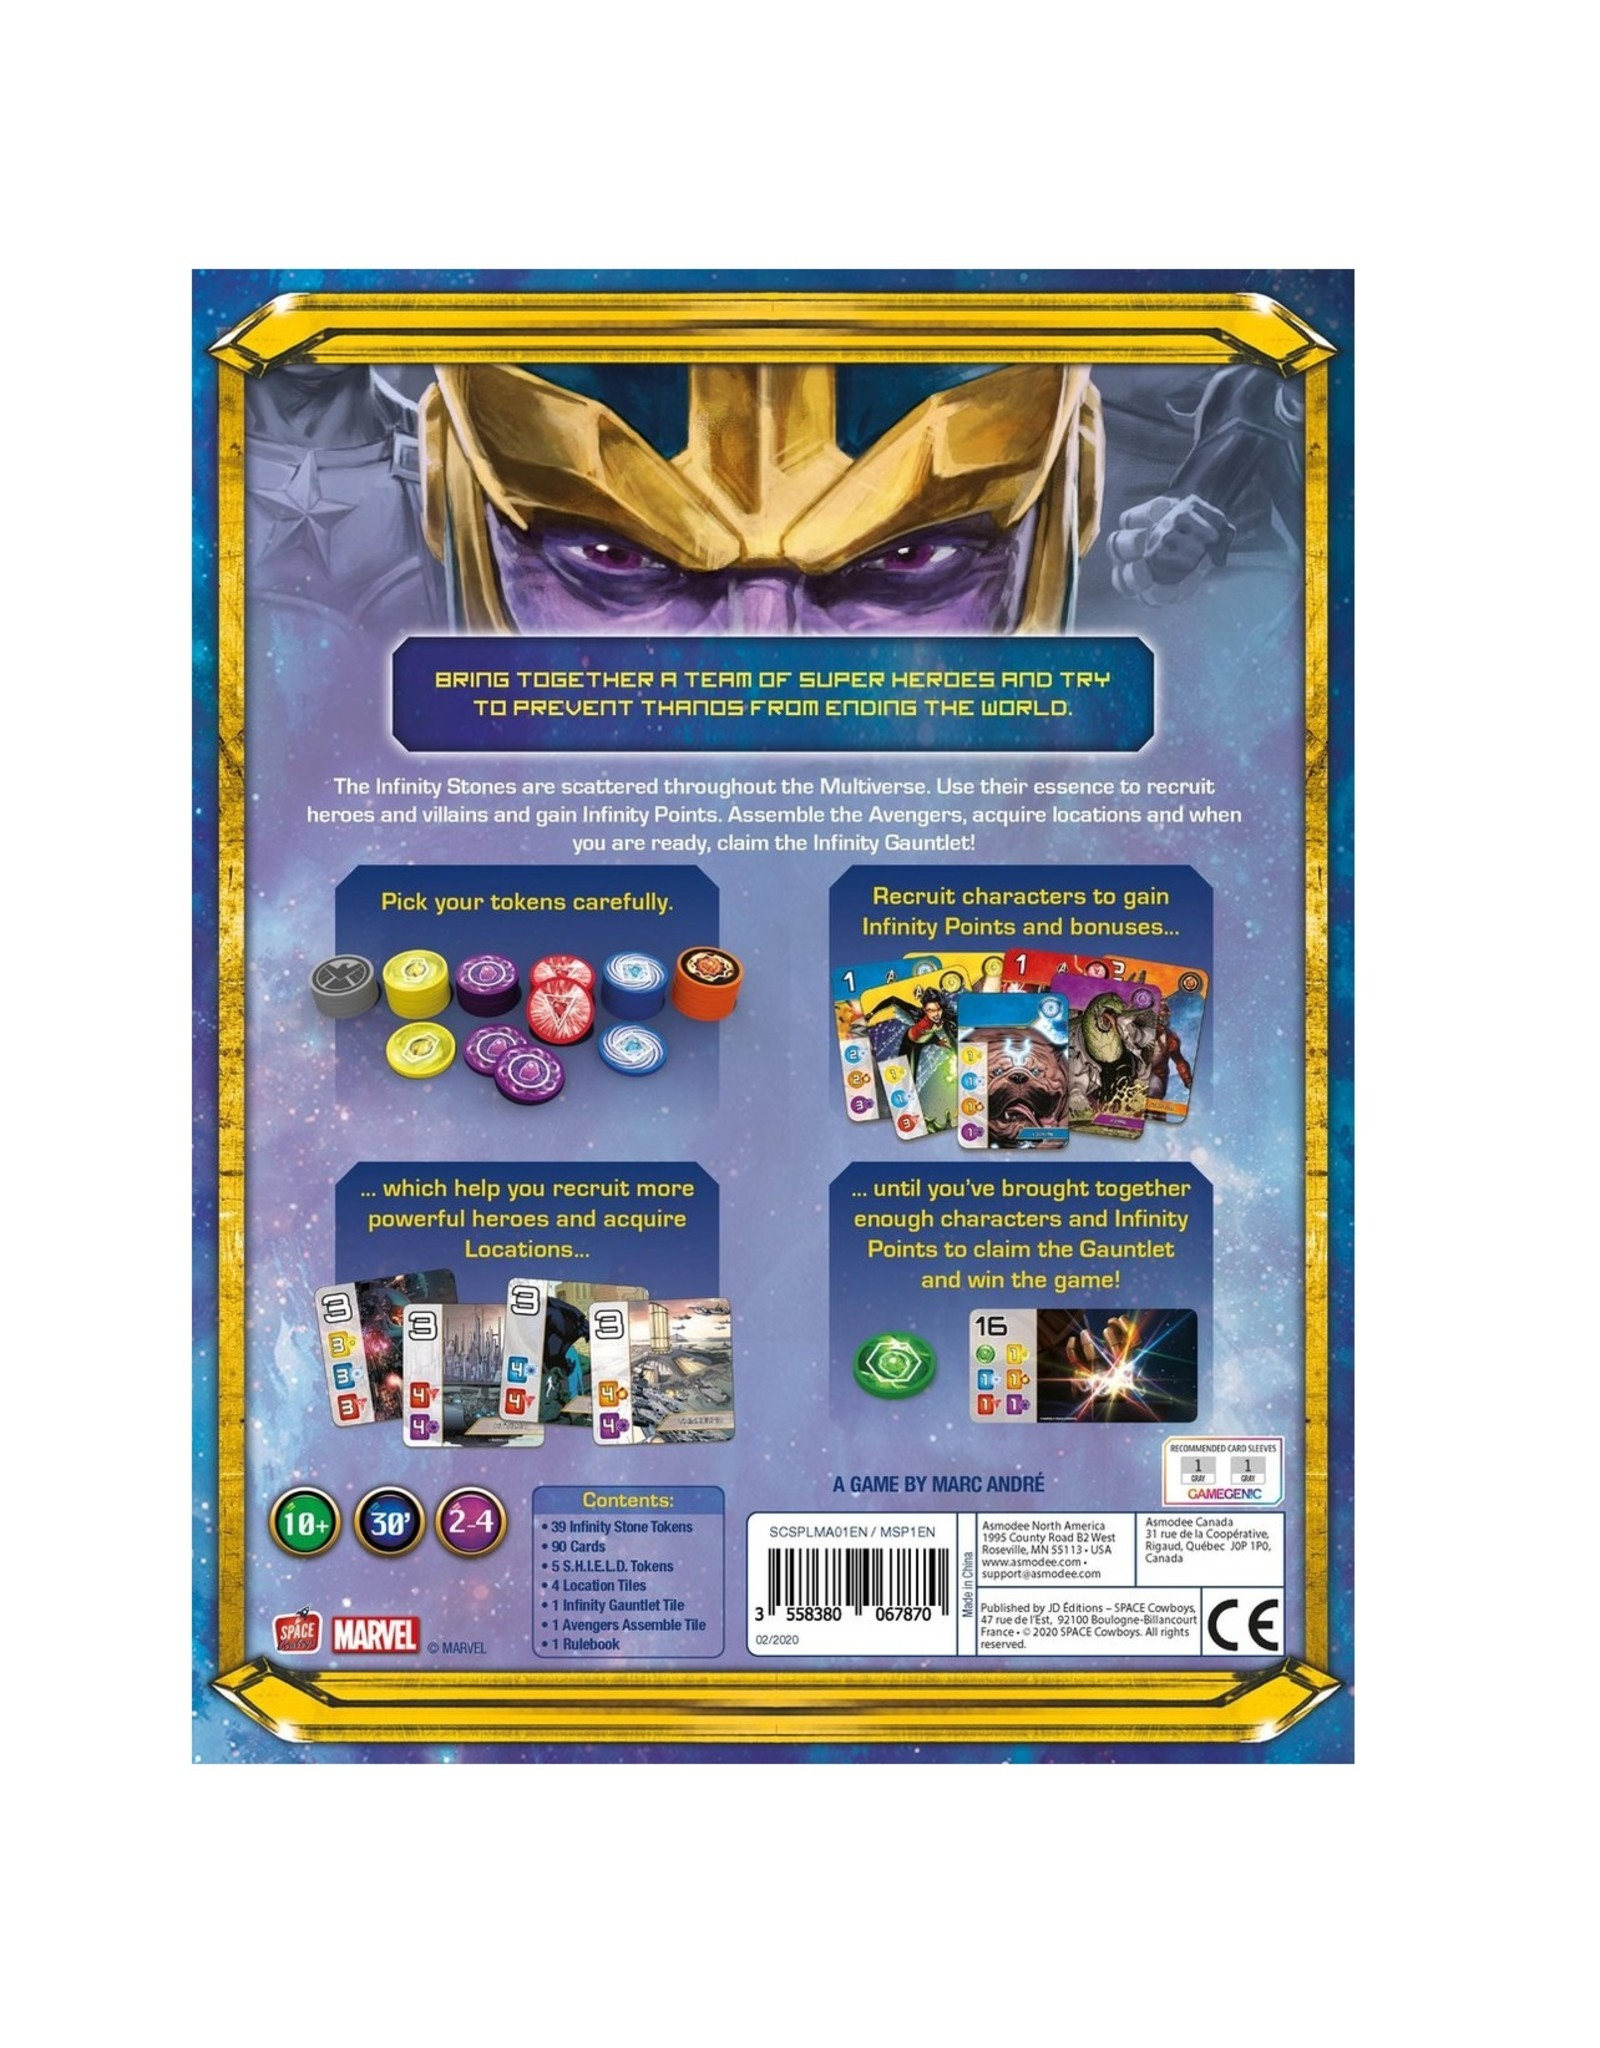 Splendor - Marvel Editie - Bordspel - Engelstalige versie